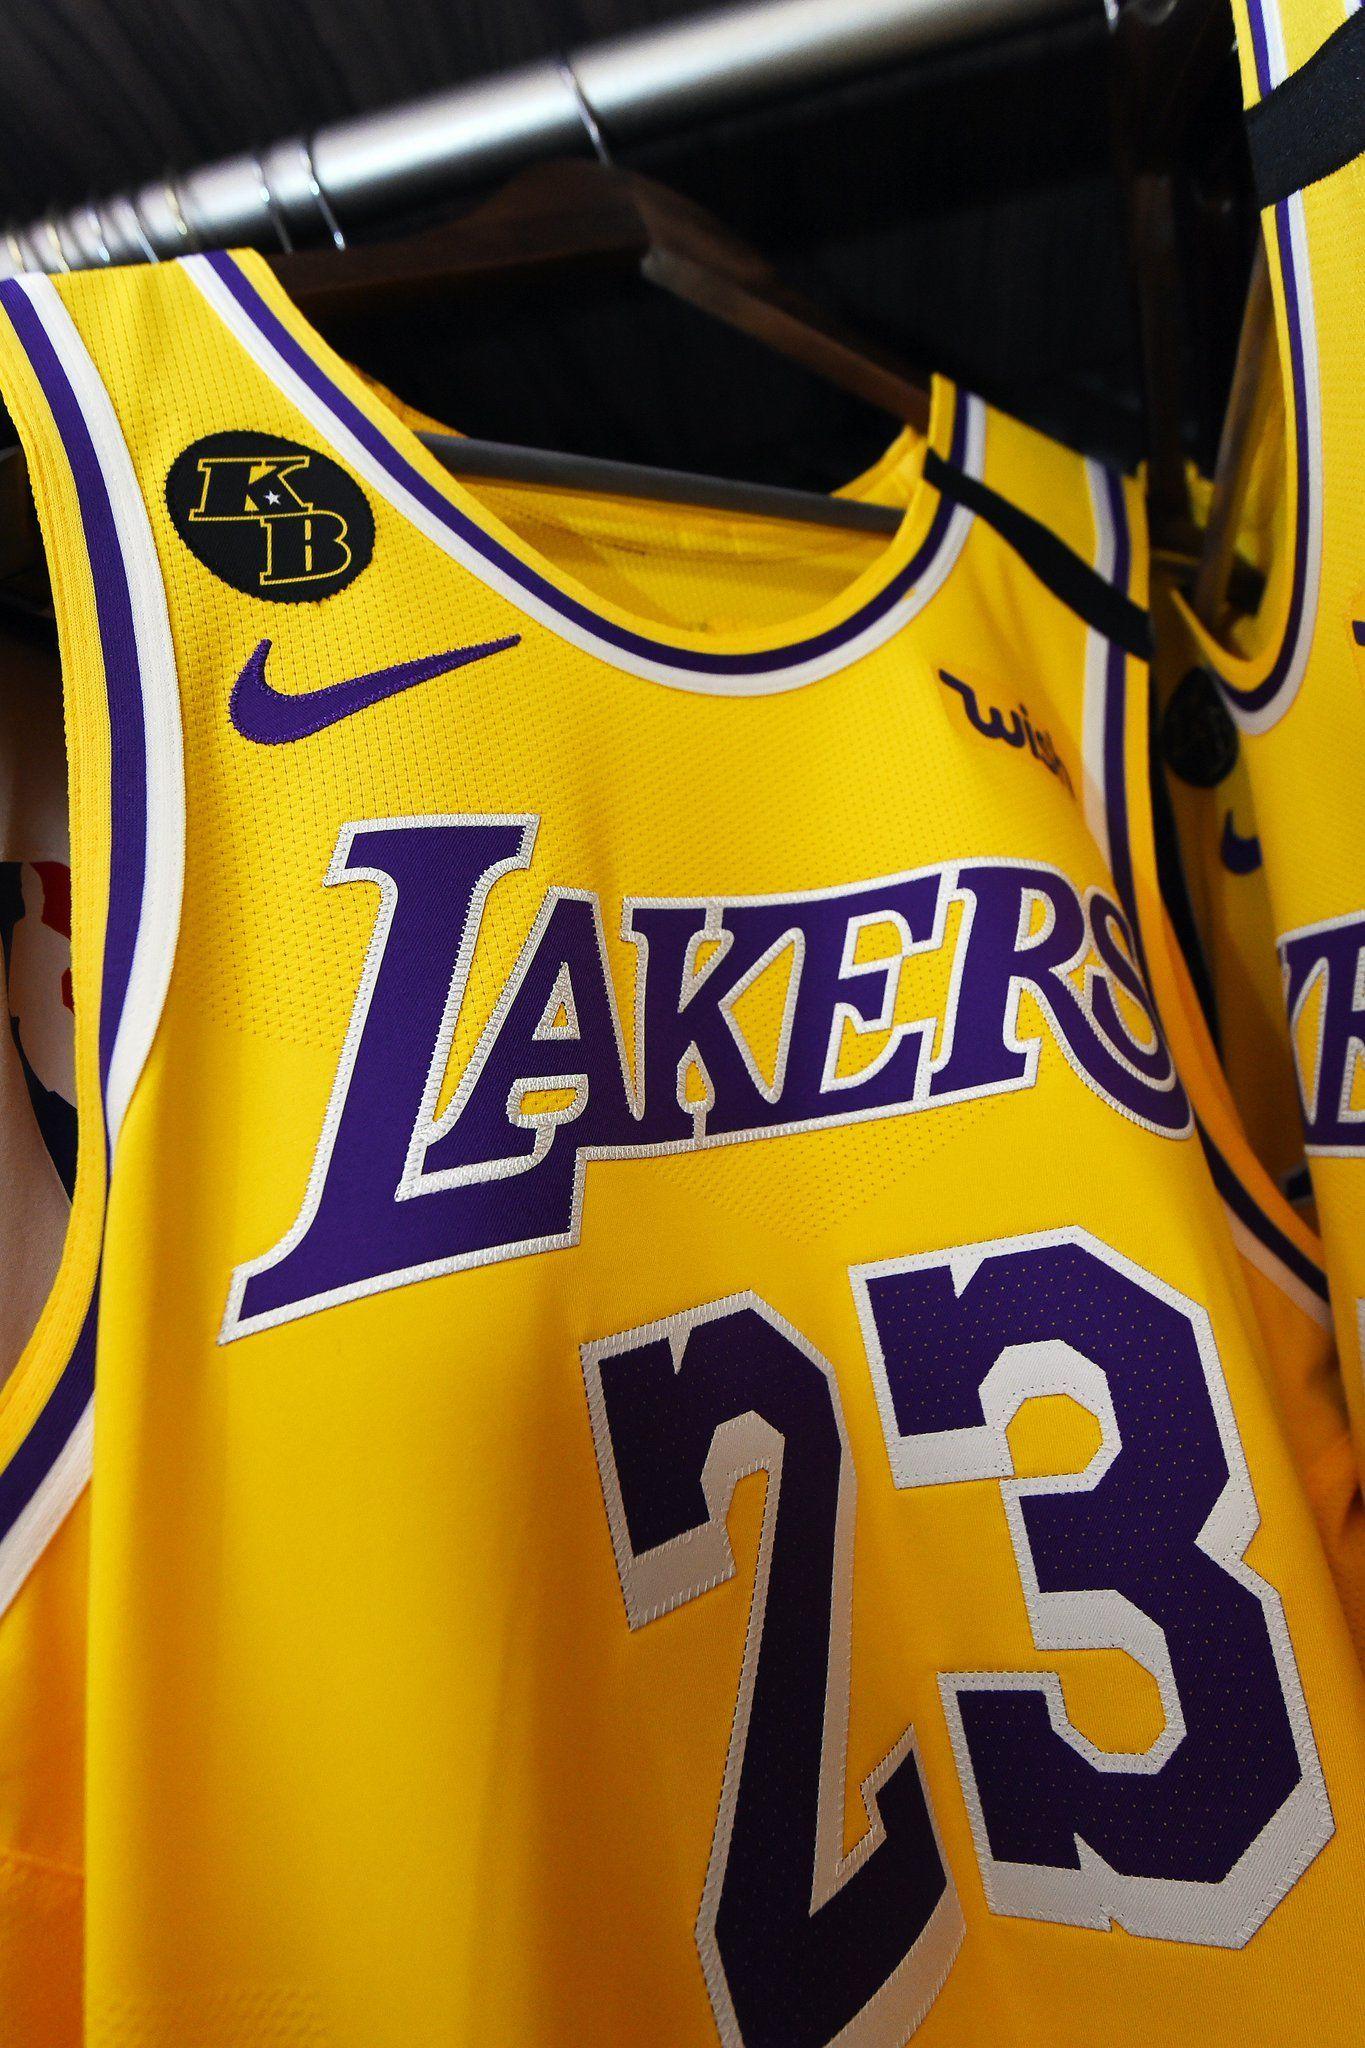 Mamba Lakeshow Mambamondays Bball Damianlillard Laker Giannisantetokounmpo Derrickrose In 2020 Lebron James Lakers Lebron James Poster Los Angeles Lakers